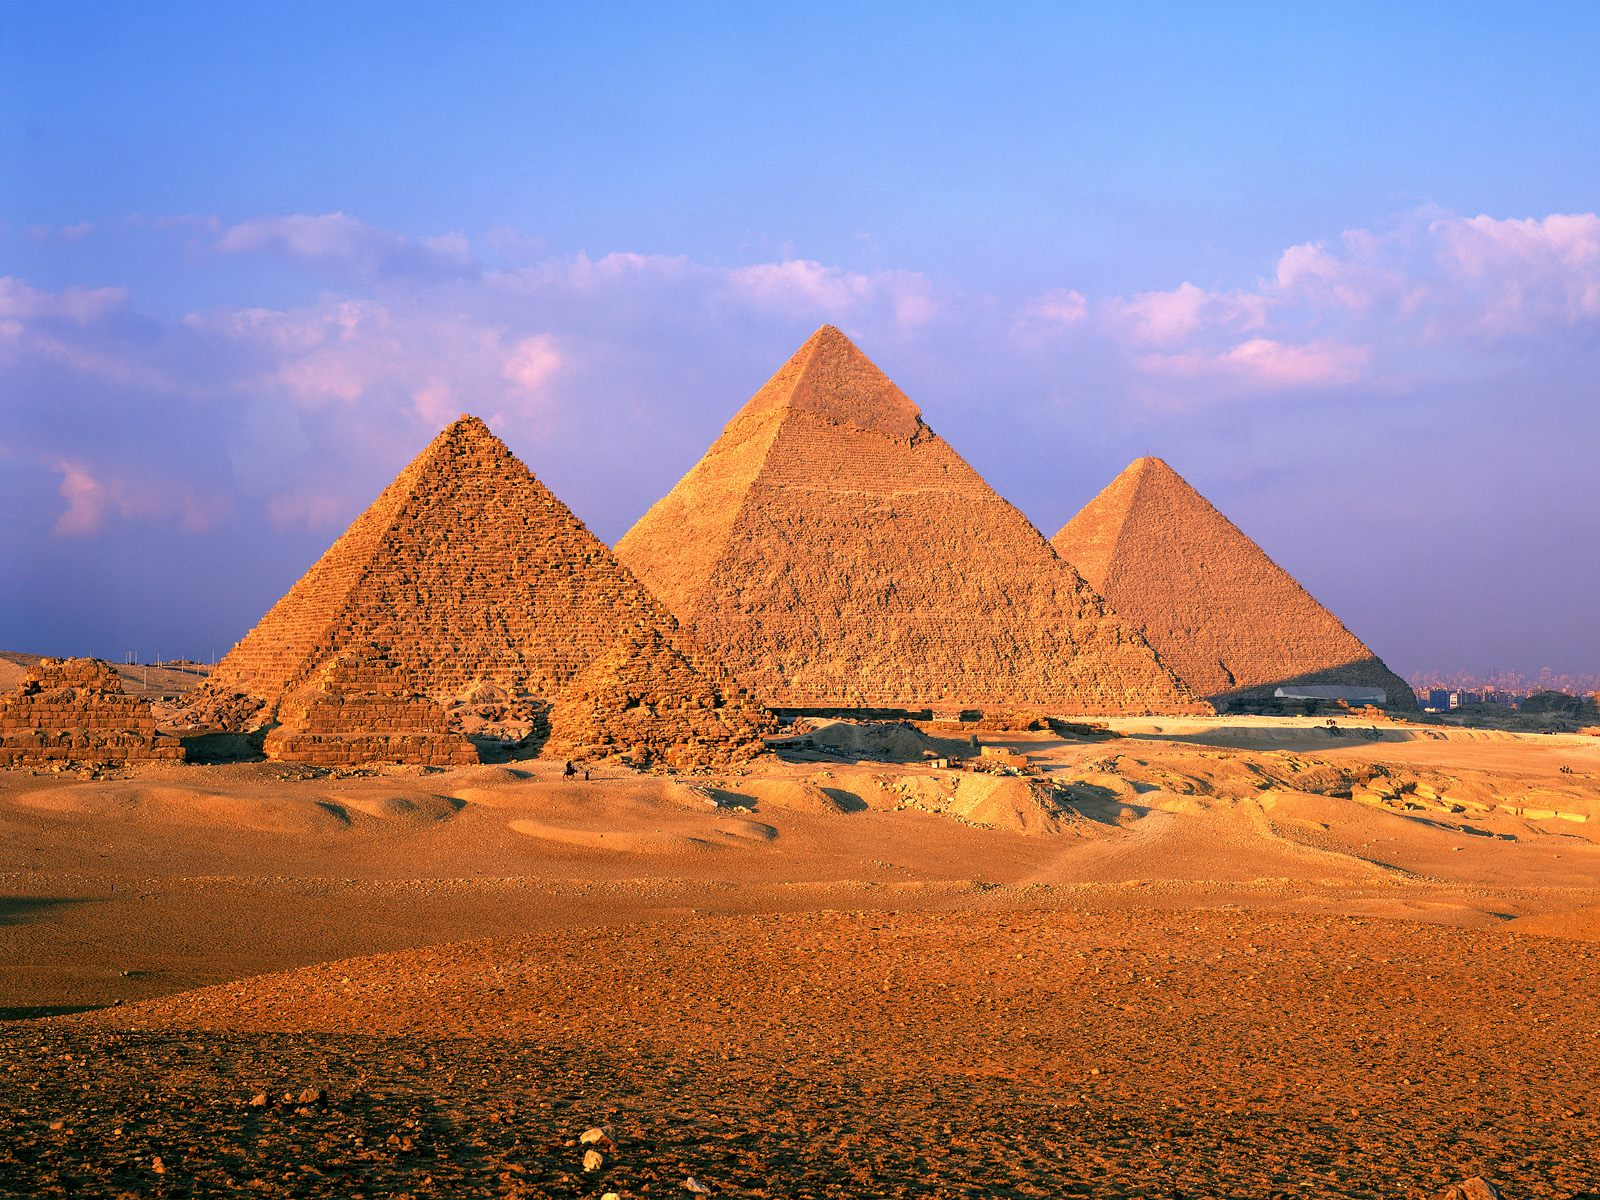 design cosmology modern day pyramids echoes of giza